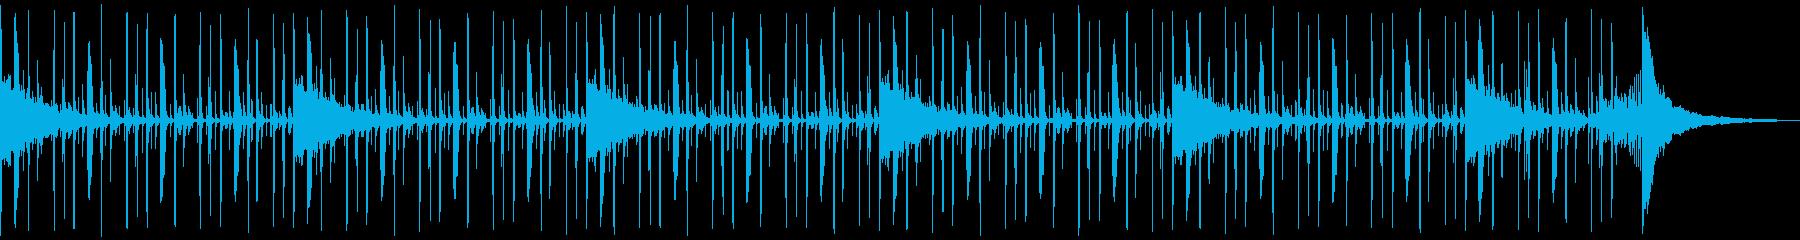 RHYTHMIC MACHINE ...の再生済みの波形